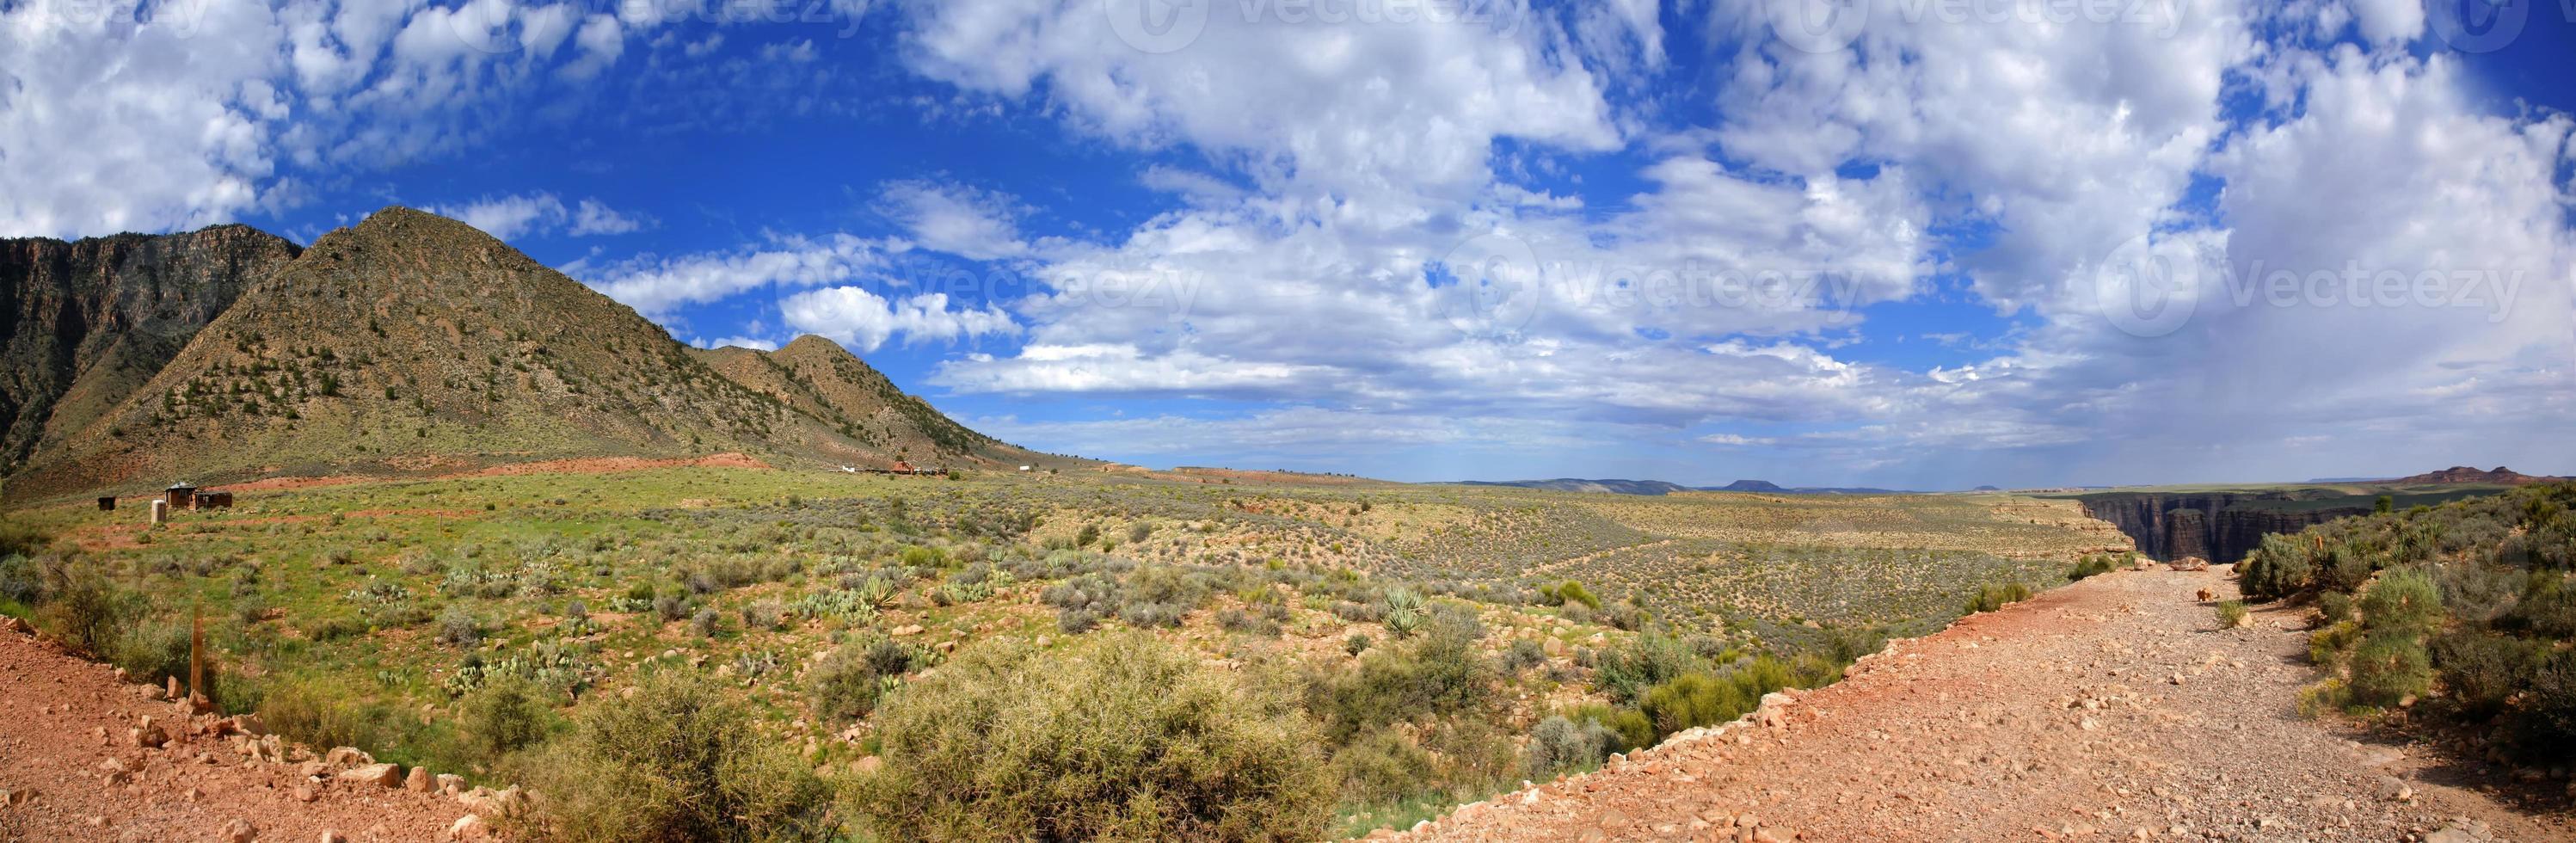 Arizona woestijn - Verenigde Staten foto